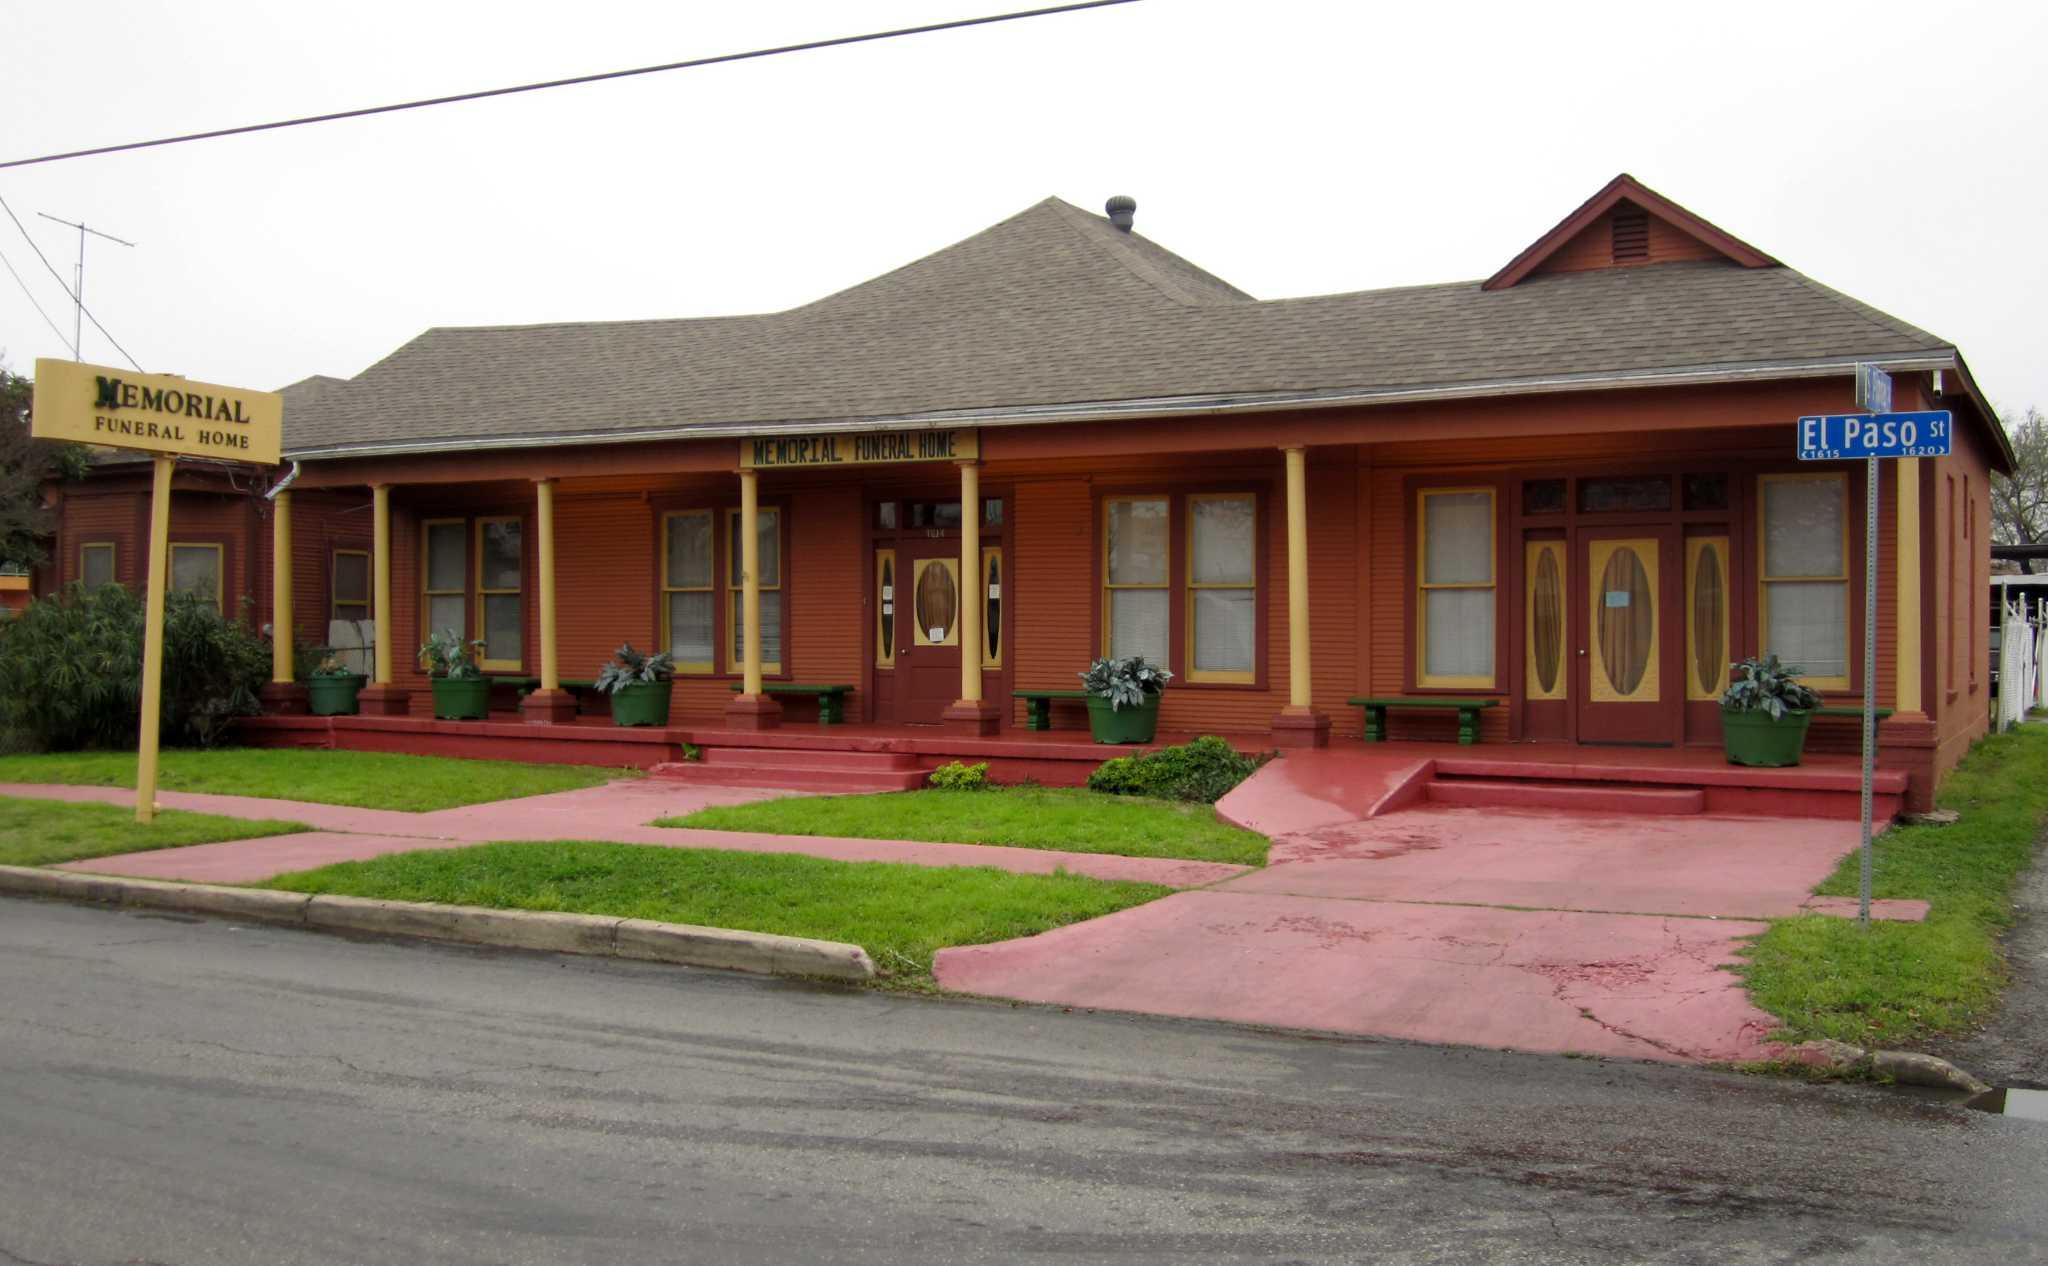 Dellcrest Funeral Home - Eastside - San Antonio, TX - Yelp